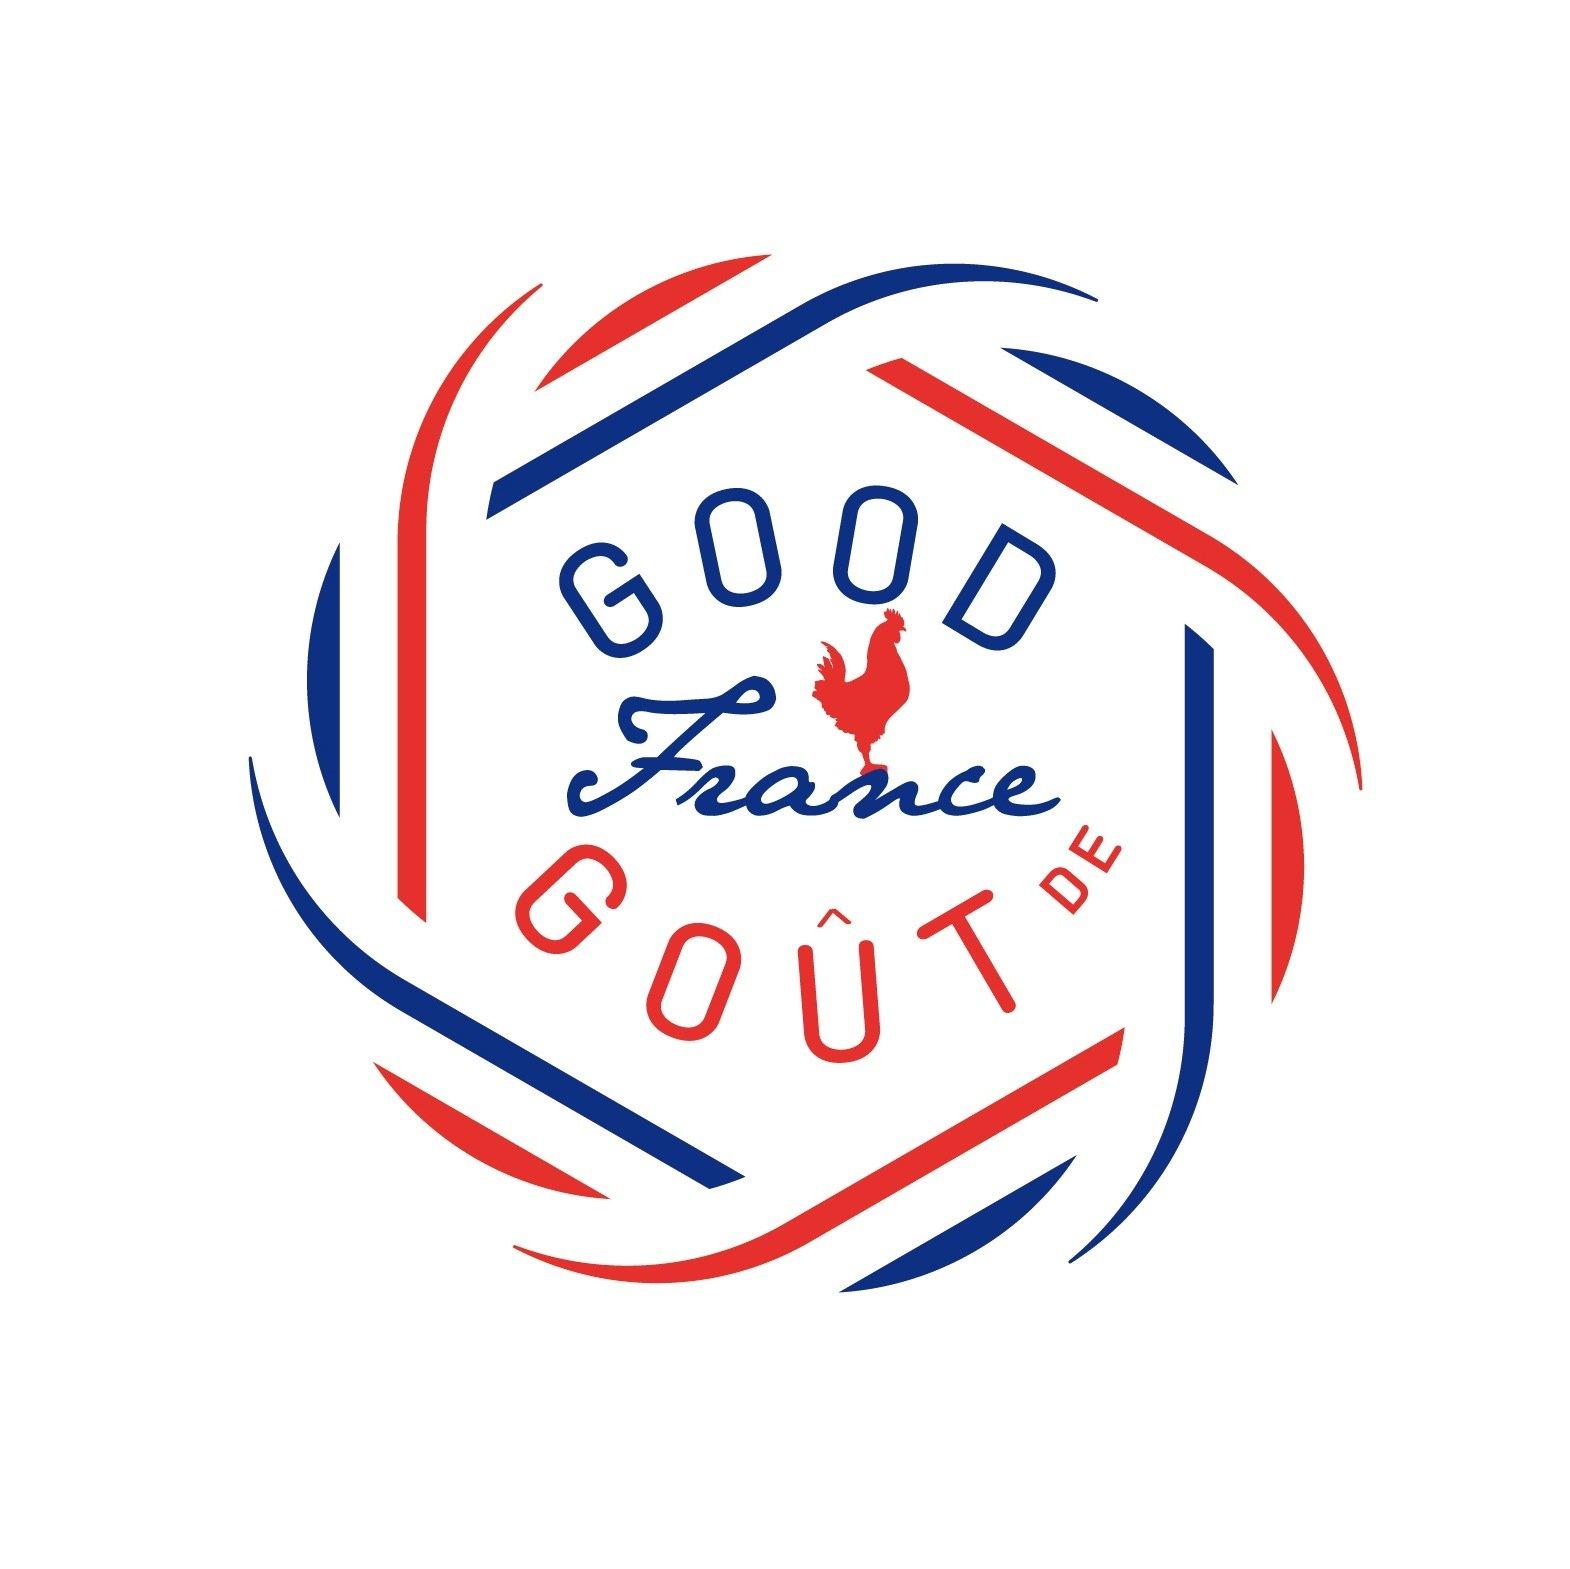 GOOD FRANCE LOGO